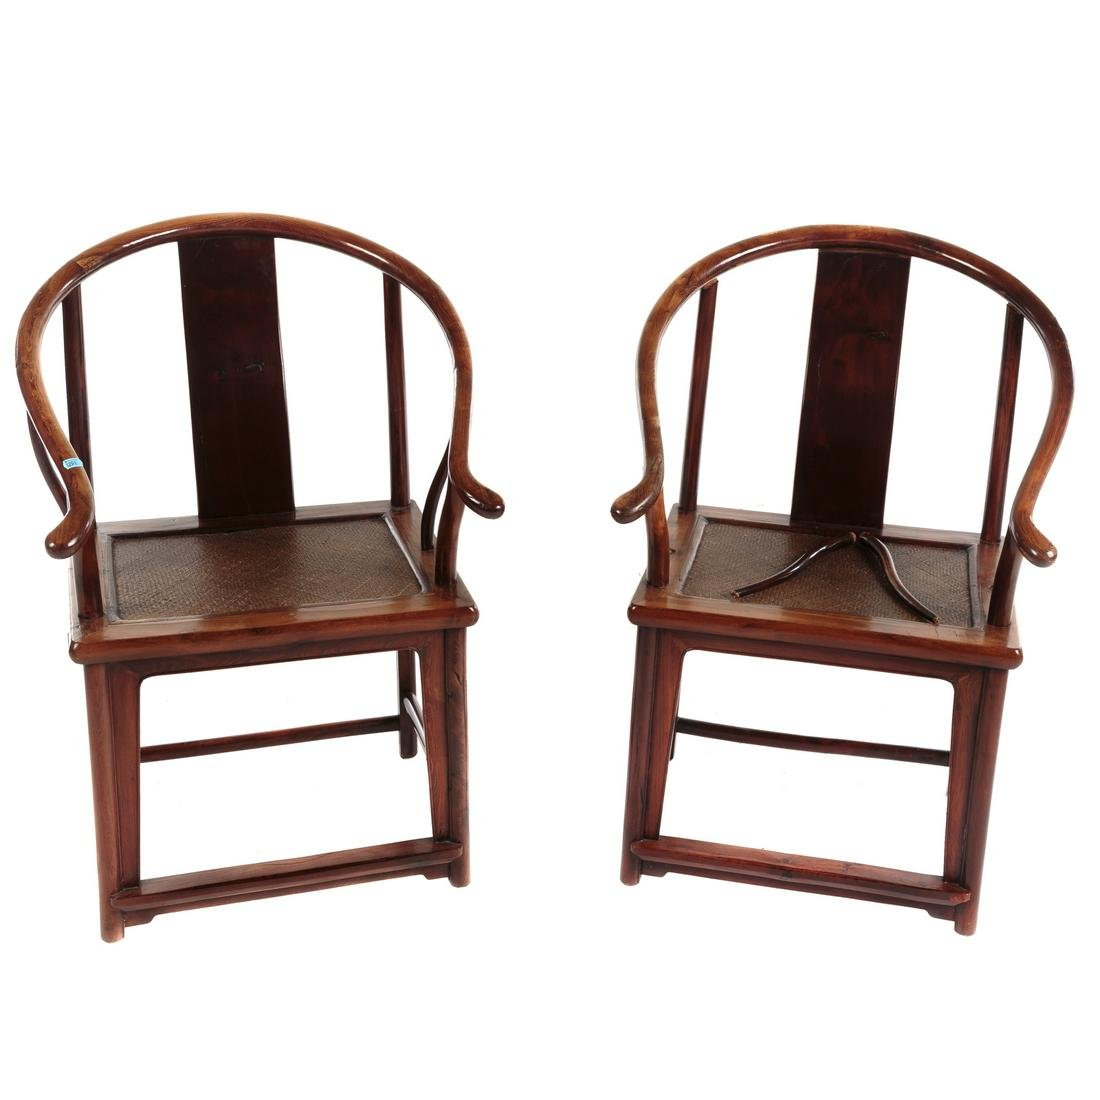 Pair Of Chinese Yew Wood Yoke Back Arm Chairs